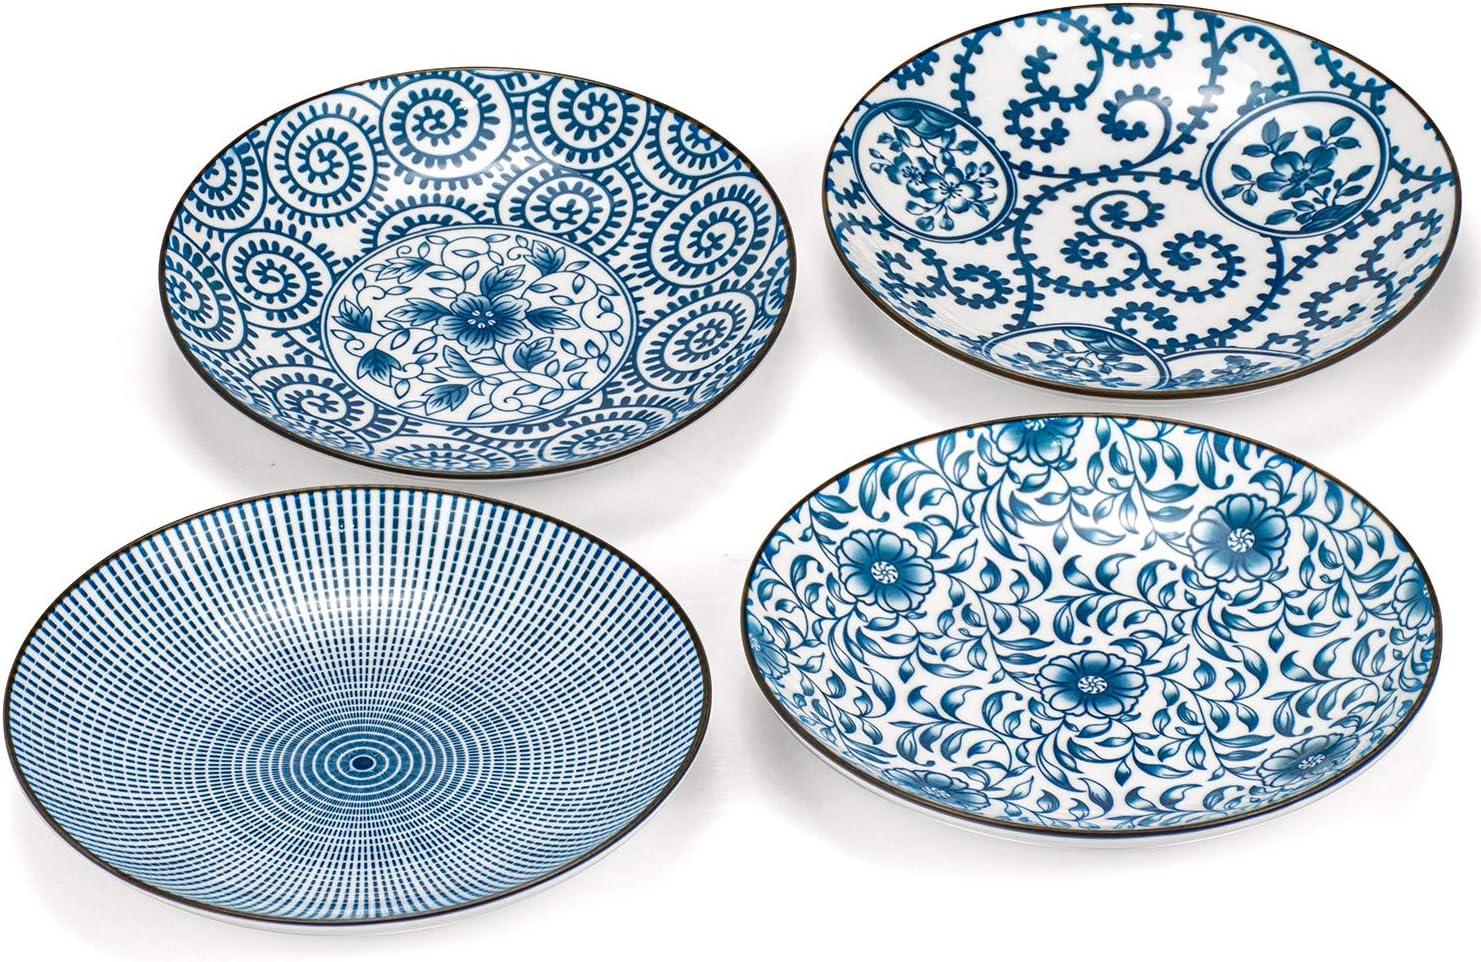 Foraineam Set of 4 Blue and White Porcelain Serving Plates Floral Dinner Shallow Plates Appetizer Salad Dessert Snack Plate Set